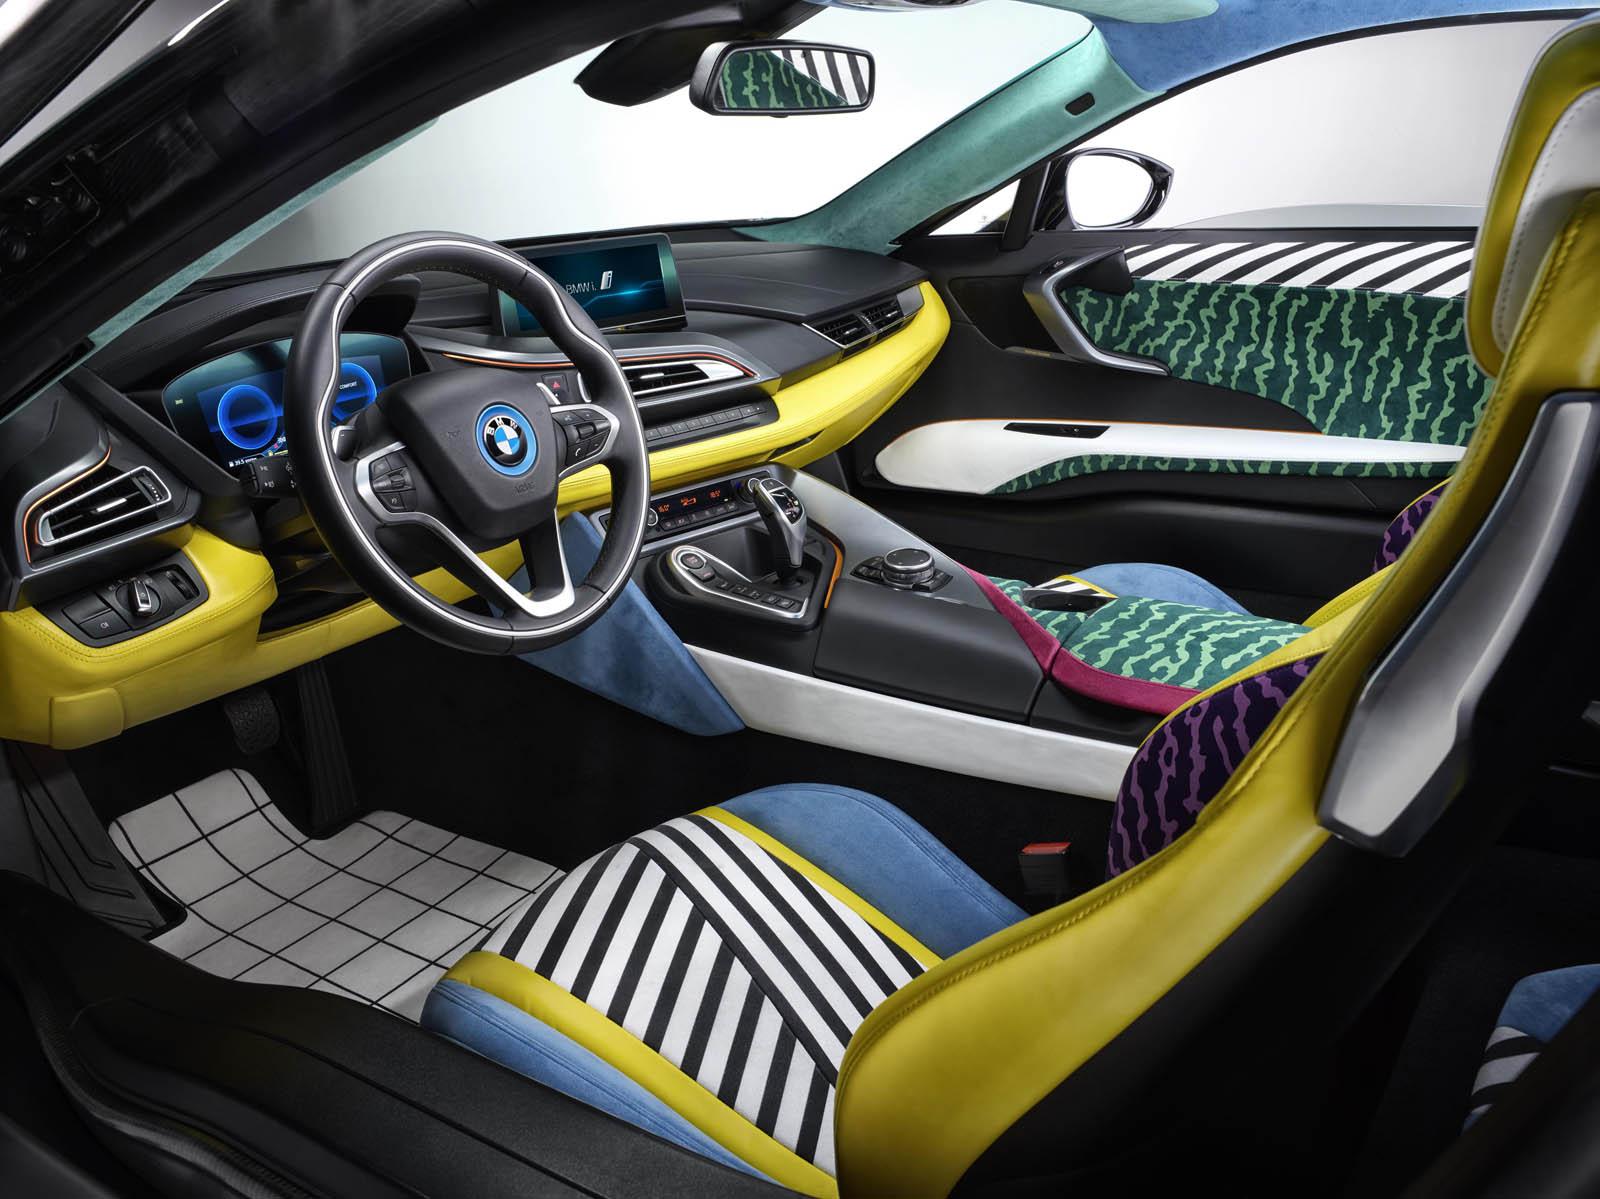 BMW i3 and i8 by Garage Italia Customs (7)